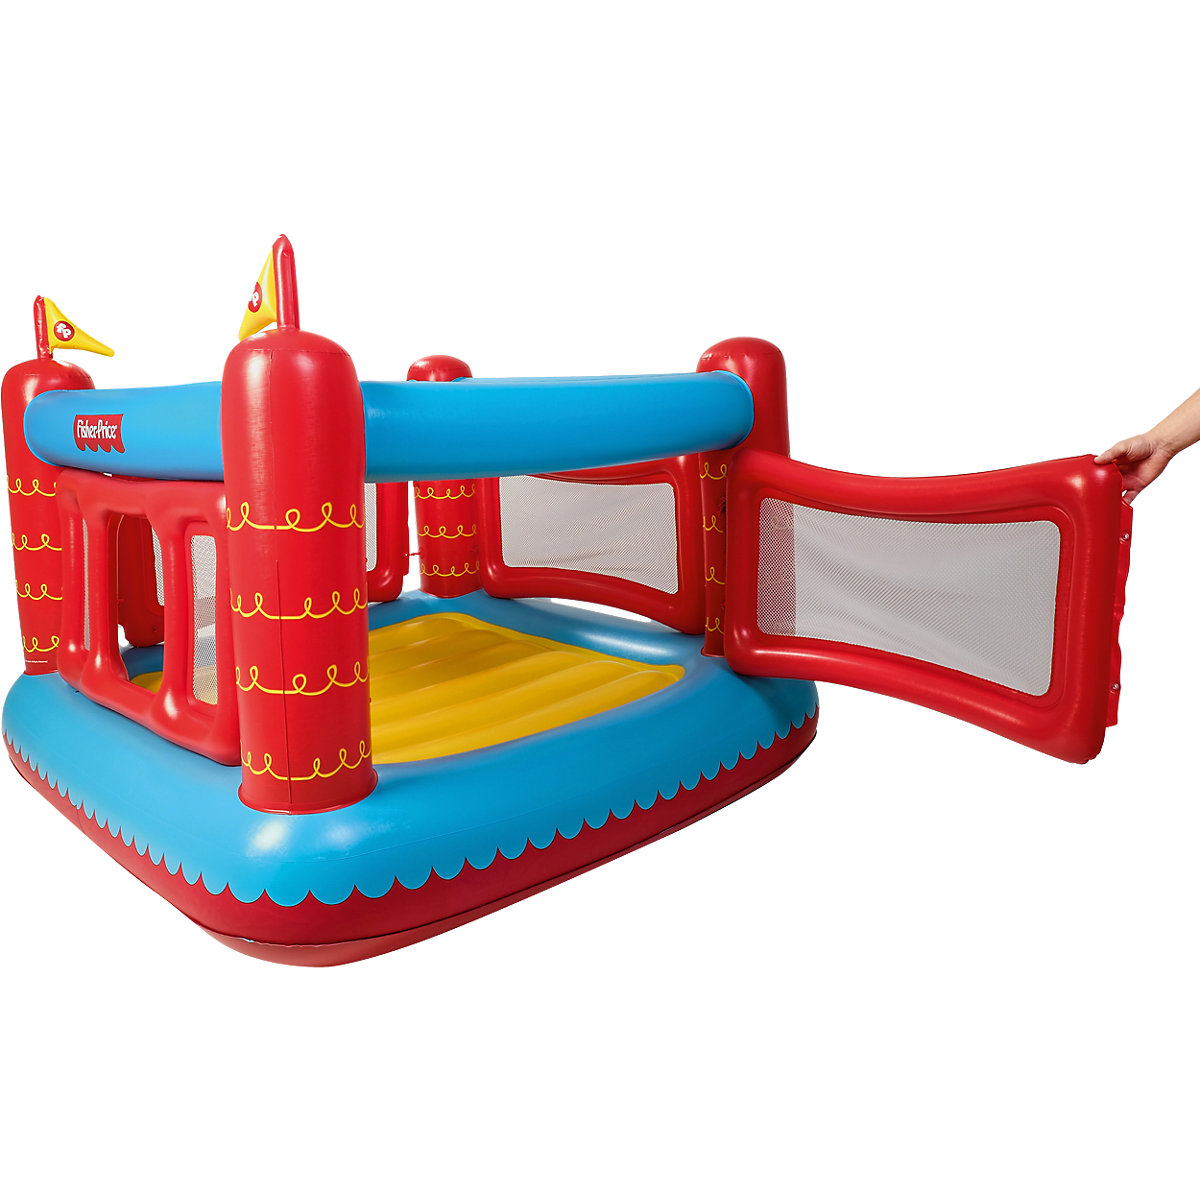 Bouncers,Jumpers & Swings BESTWAY 4639774 Games Toy Trampoline For Children Kids Game Trampolines MTpromo